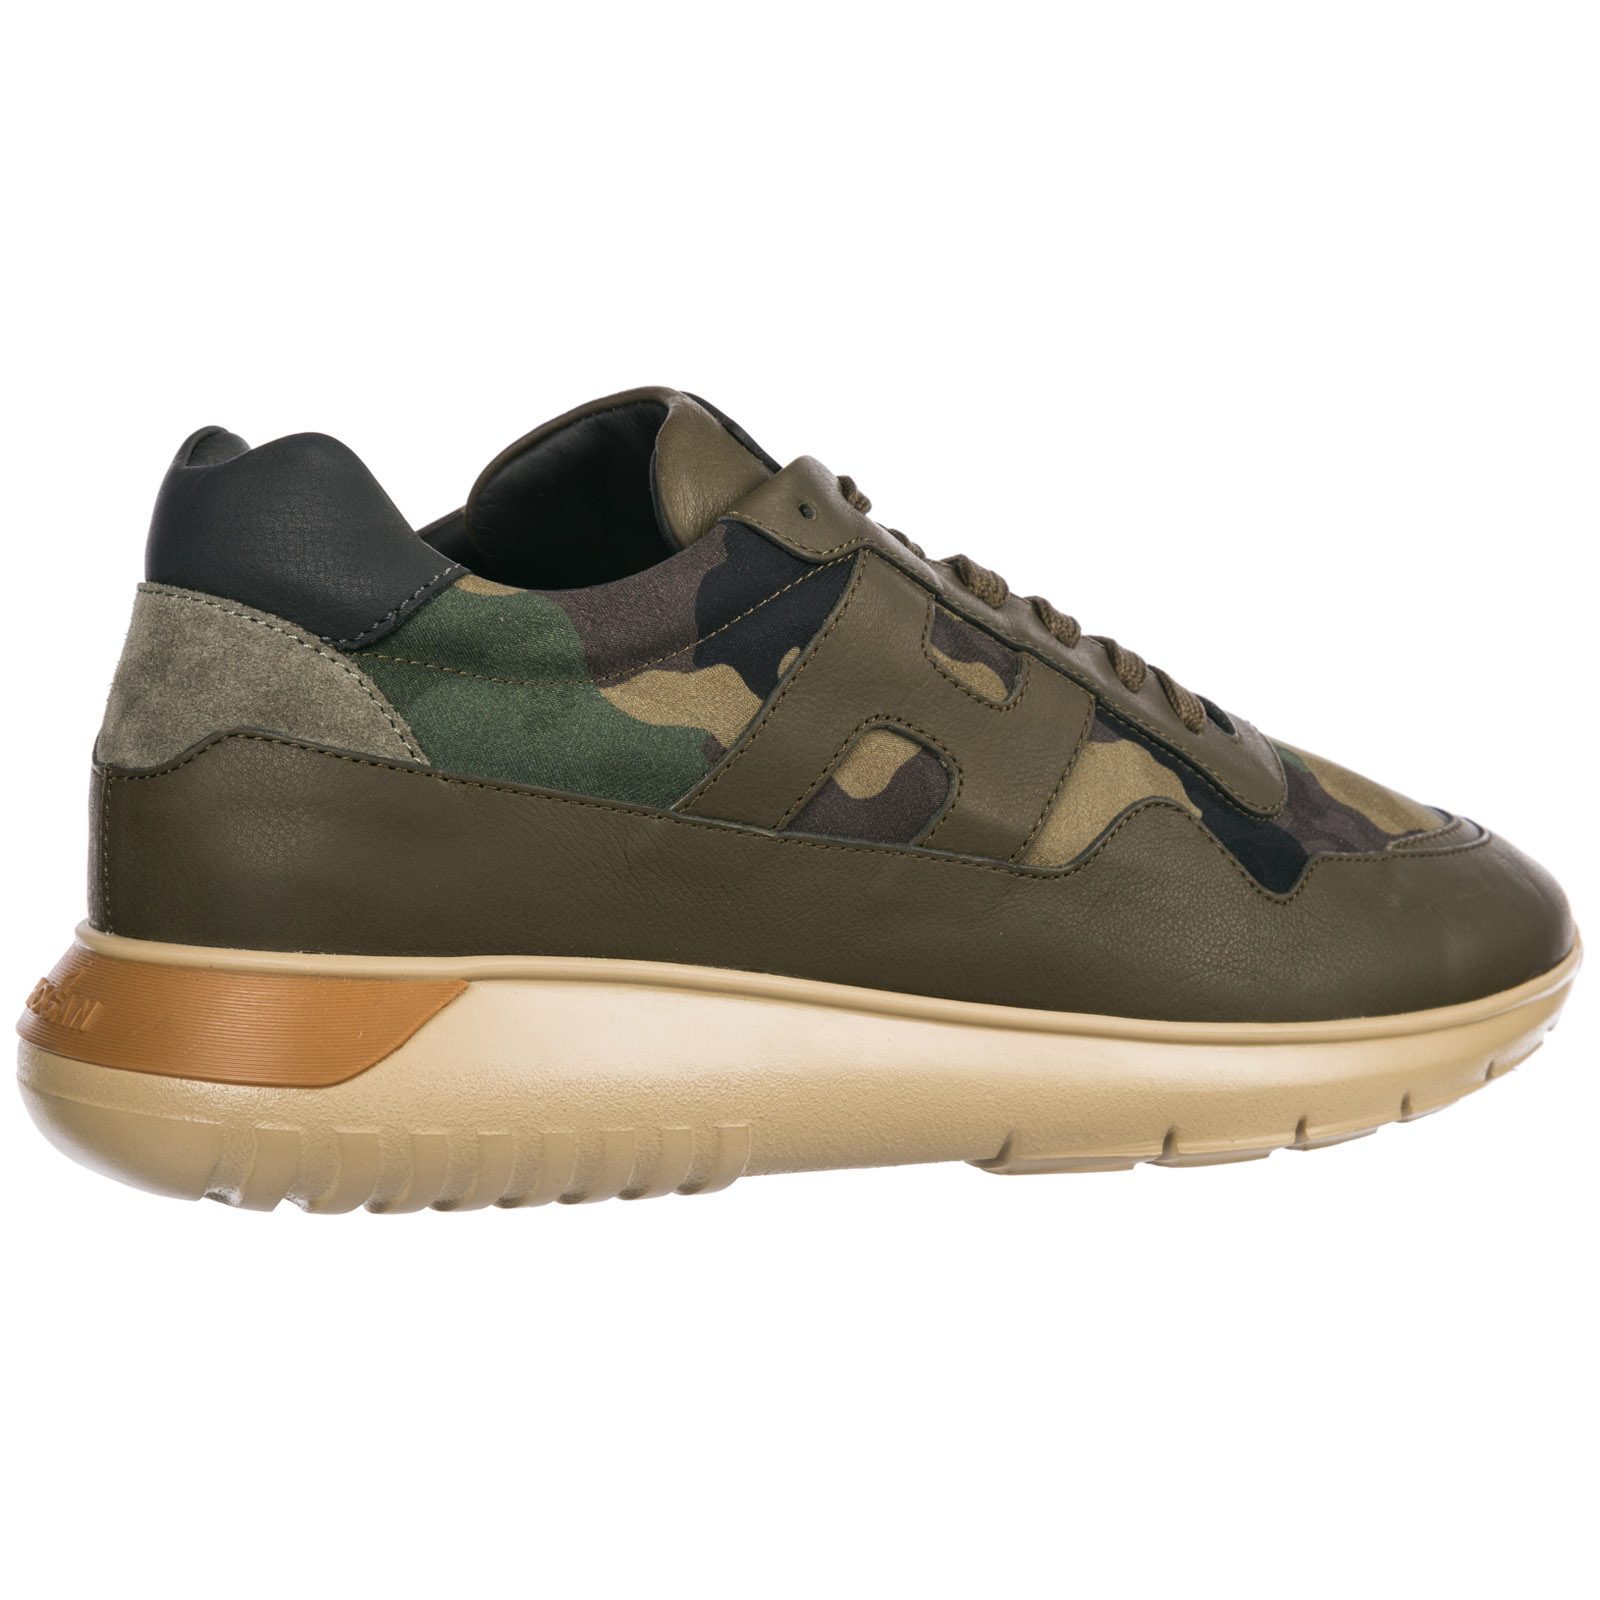 58b8ad2bf35e3 Sneakers Hogan Interactive³ HXM3710AJ11JFT249N verde | FRMODA.com